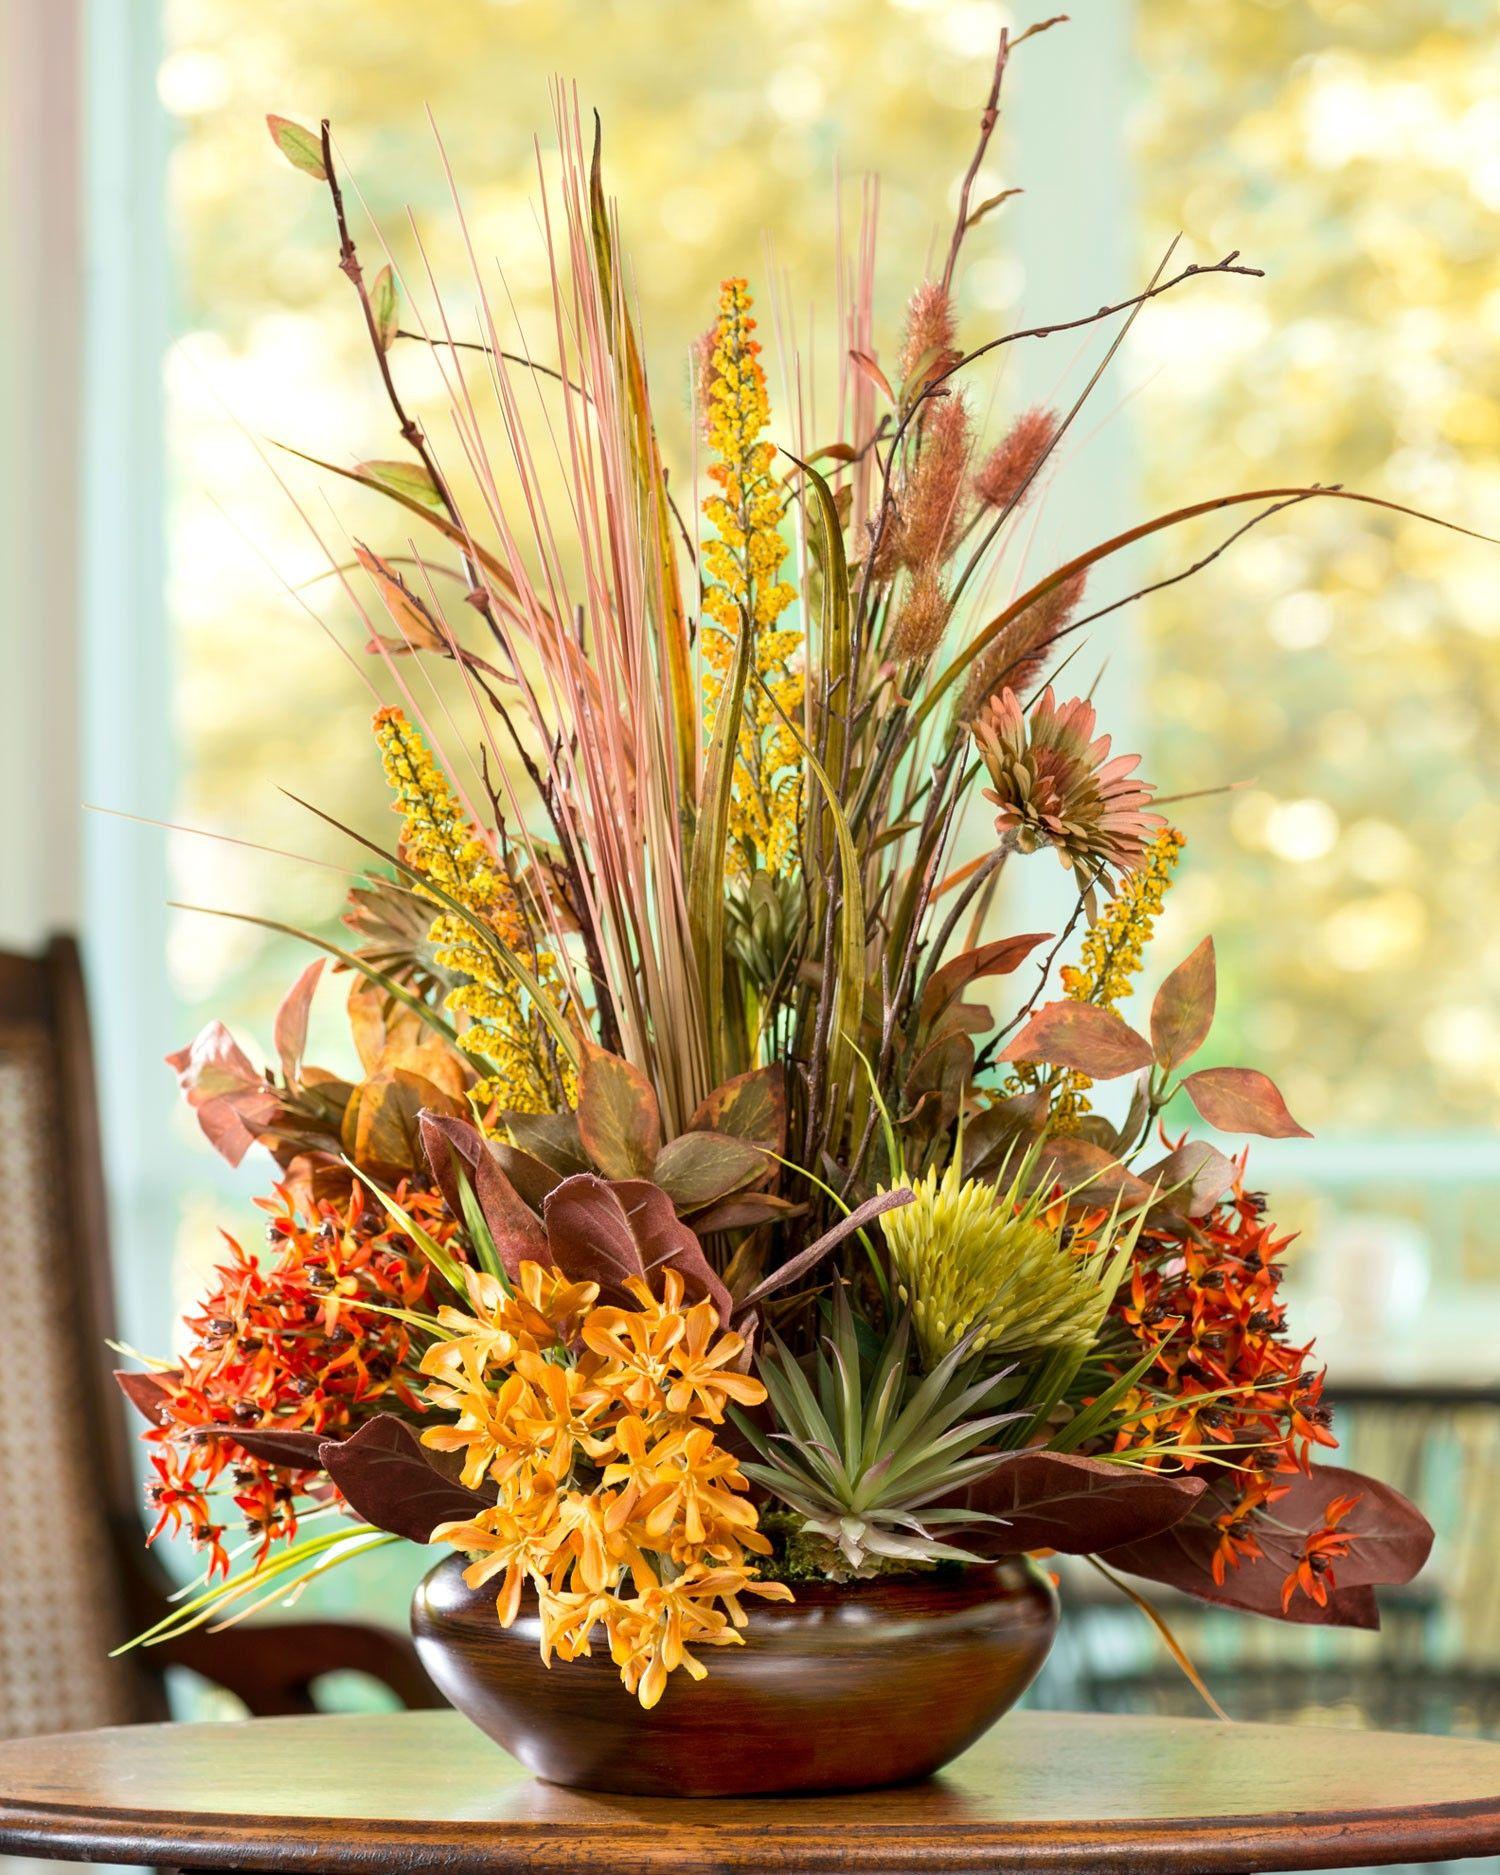 Arranged In A Glazed Golden Brown Ceramic Vase This Beautiful Silk